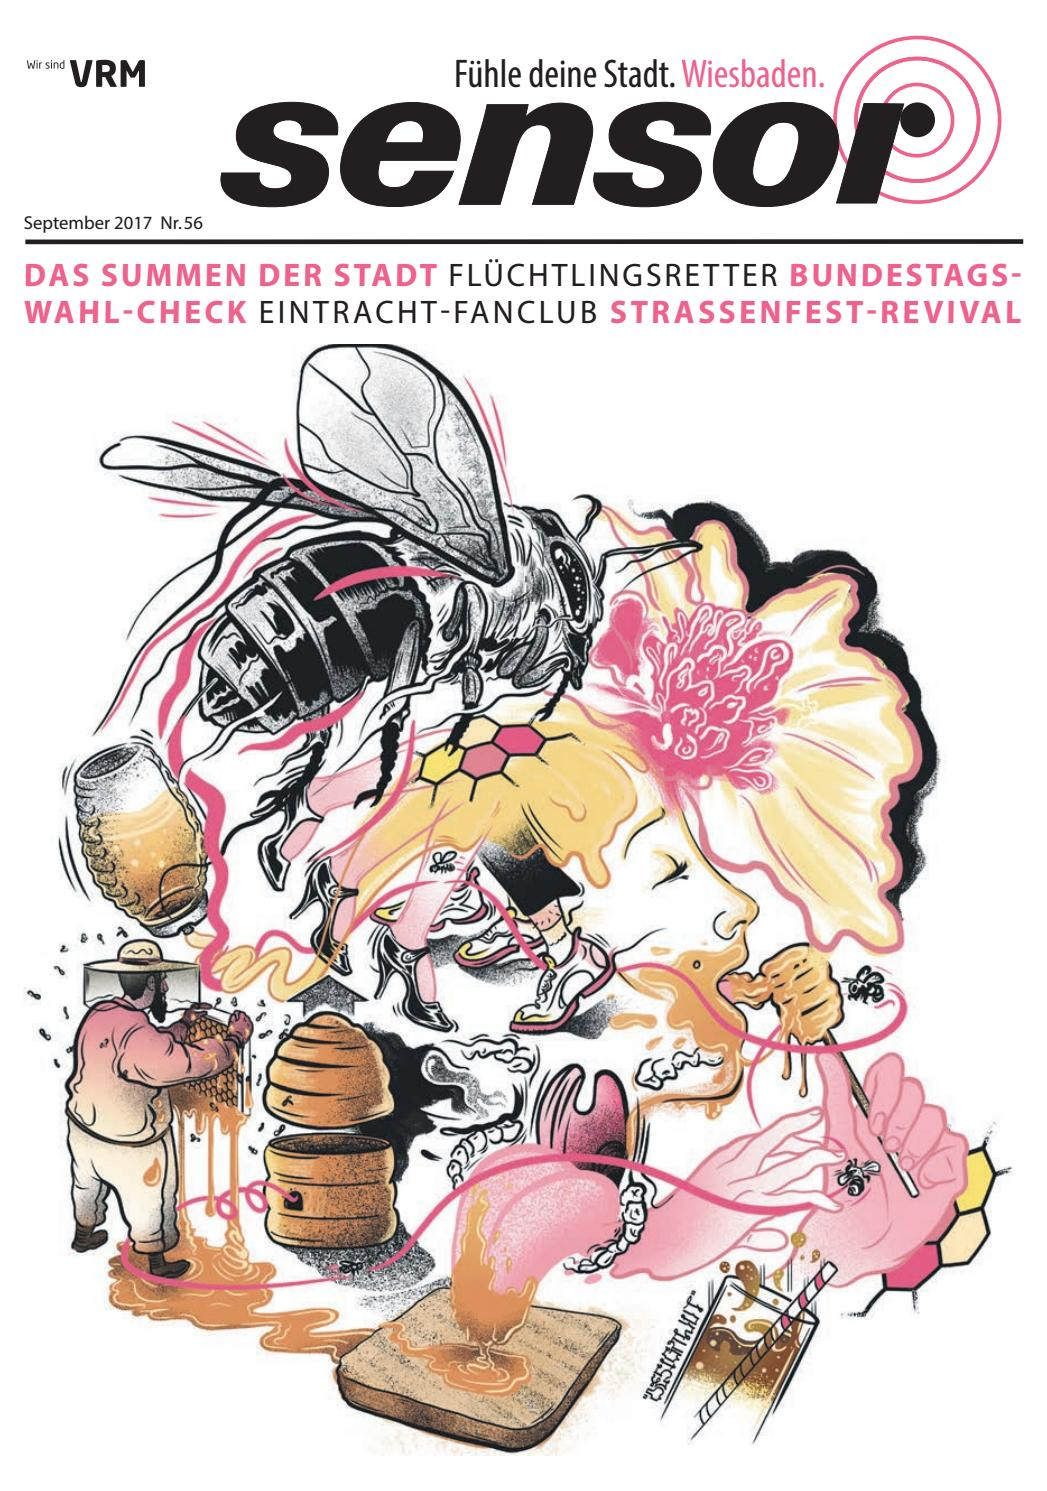 sensor Wiesbaden #56 September 2017 by sensor Magazin